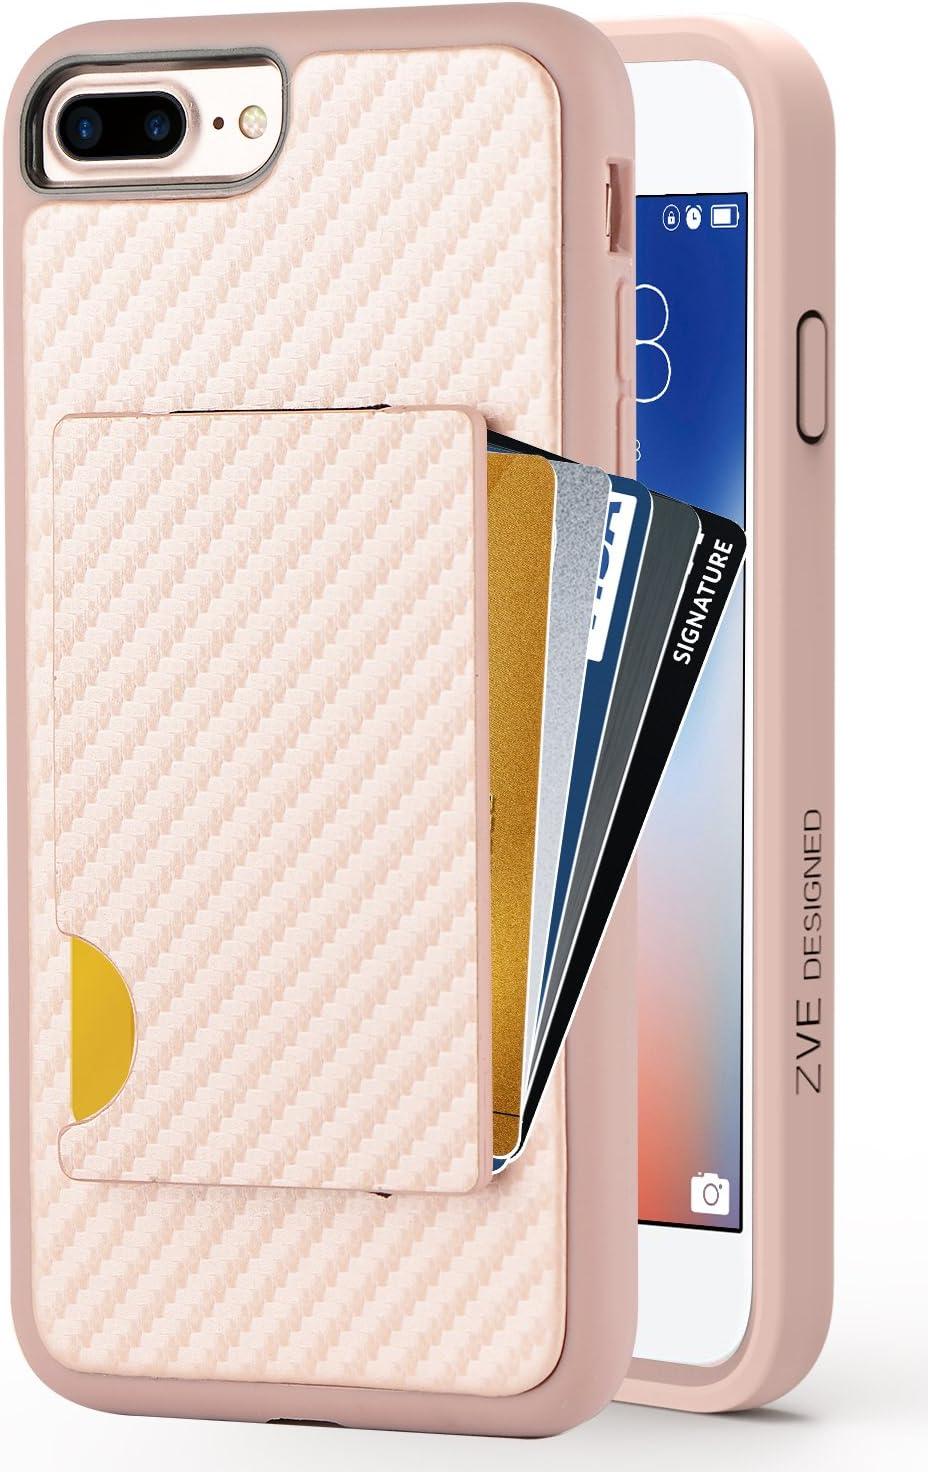 iPhone 7 Plus Wallet Case, iPhone 8 Plus Card Holder Case, ZVEdeng Protective Credit Card Case Carbon Fiber Card Grip Slim Wallet Case for Apple iPhone 7 Plus/8 Plus 5.5'' Rose Gold